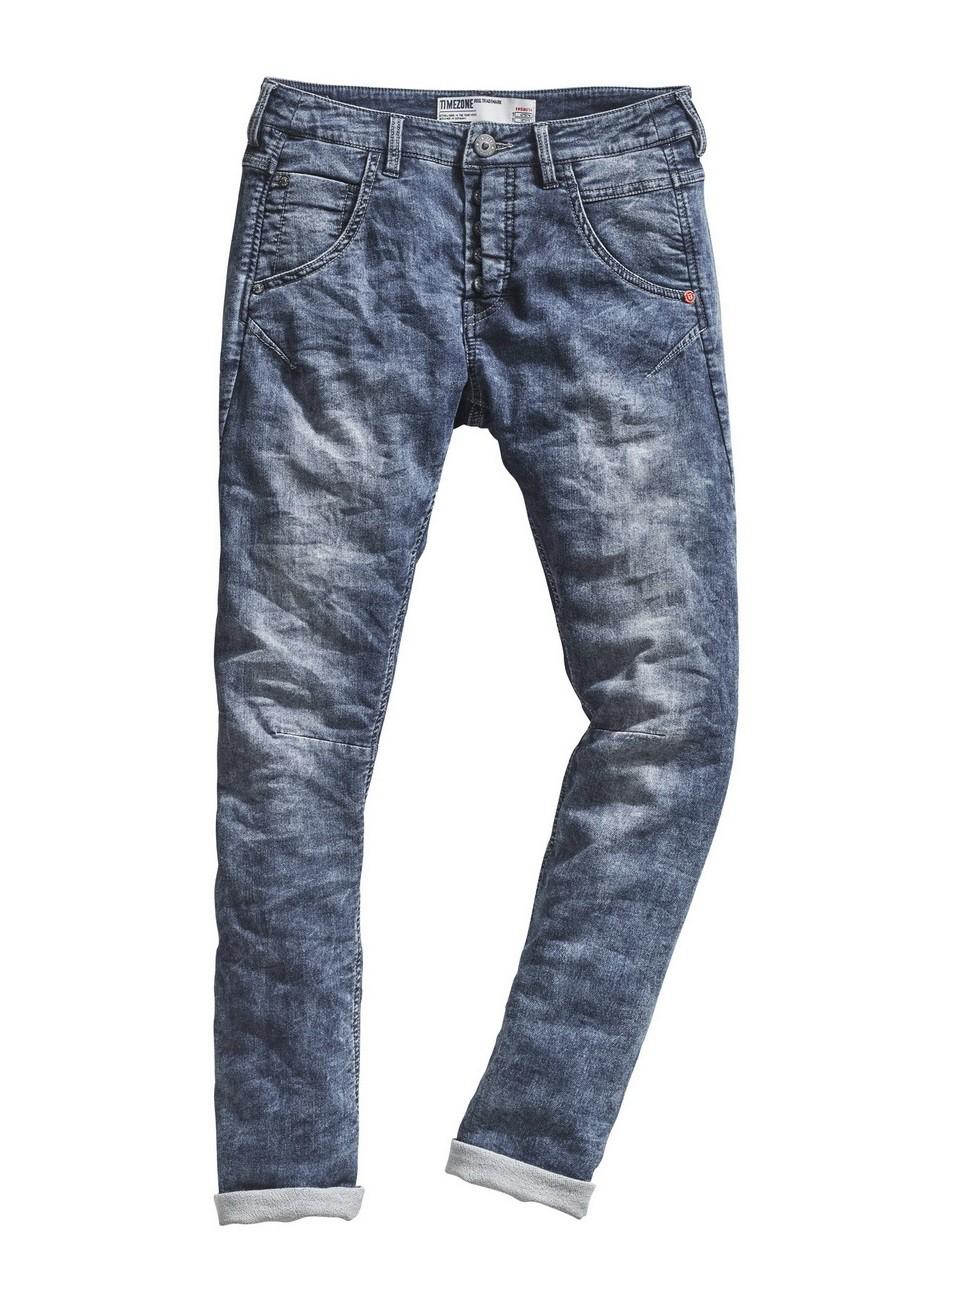 timezone damen jeans rivatz slim fit blau daily wash. Black Bedroom Furniture Sets. Home Design Ideas